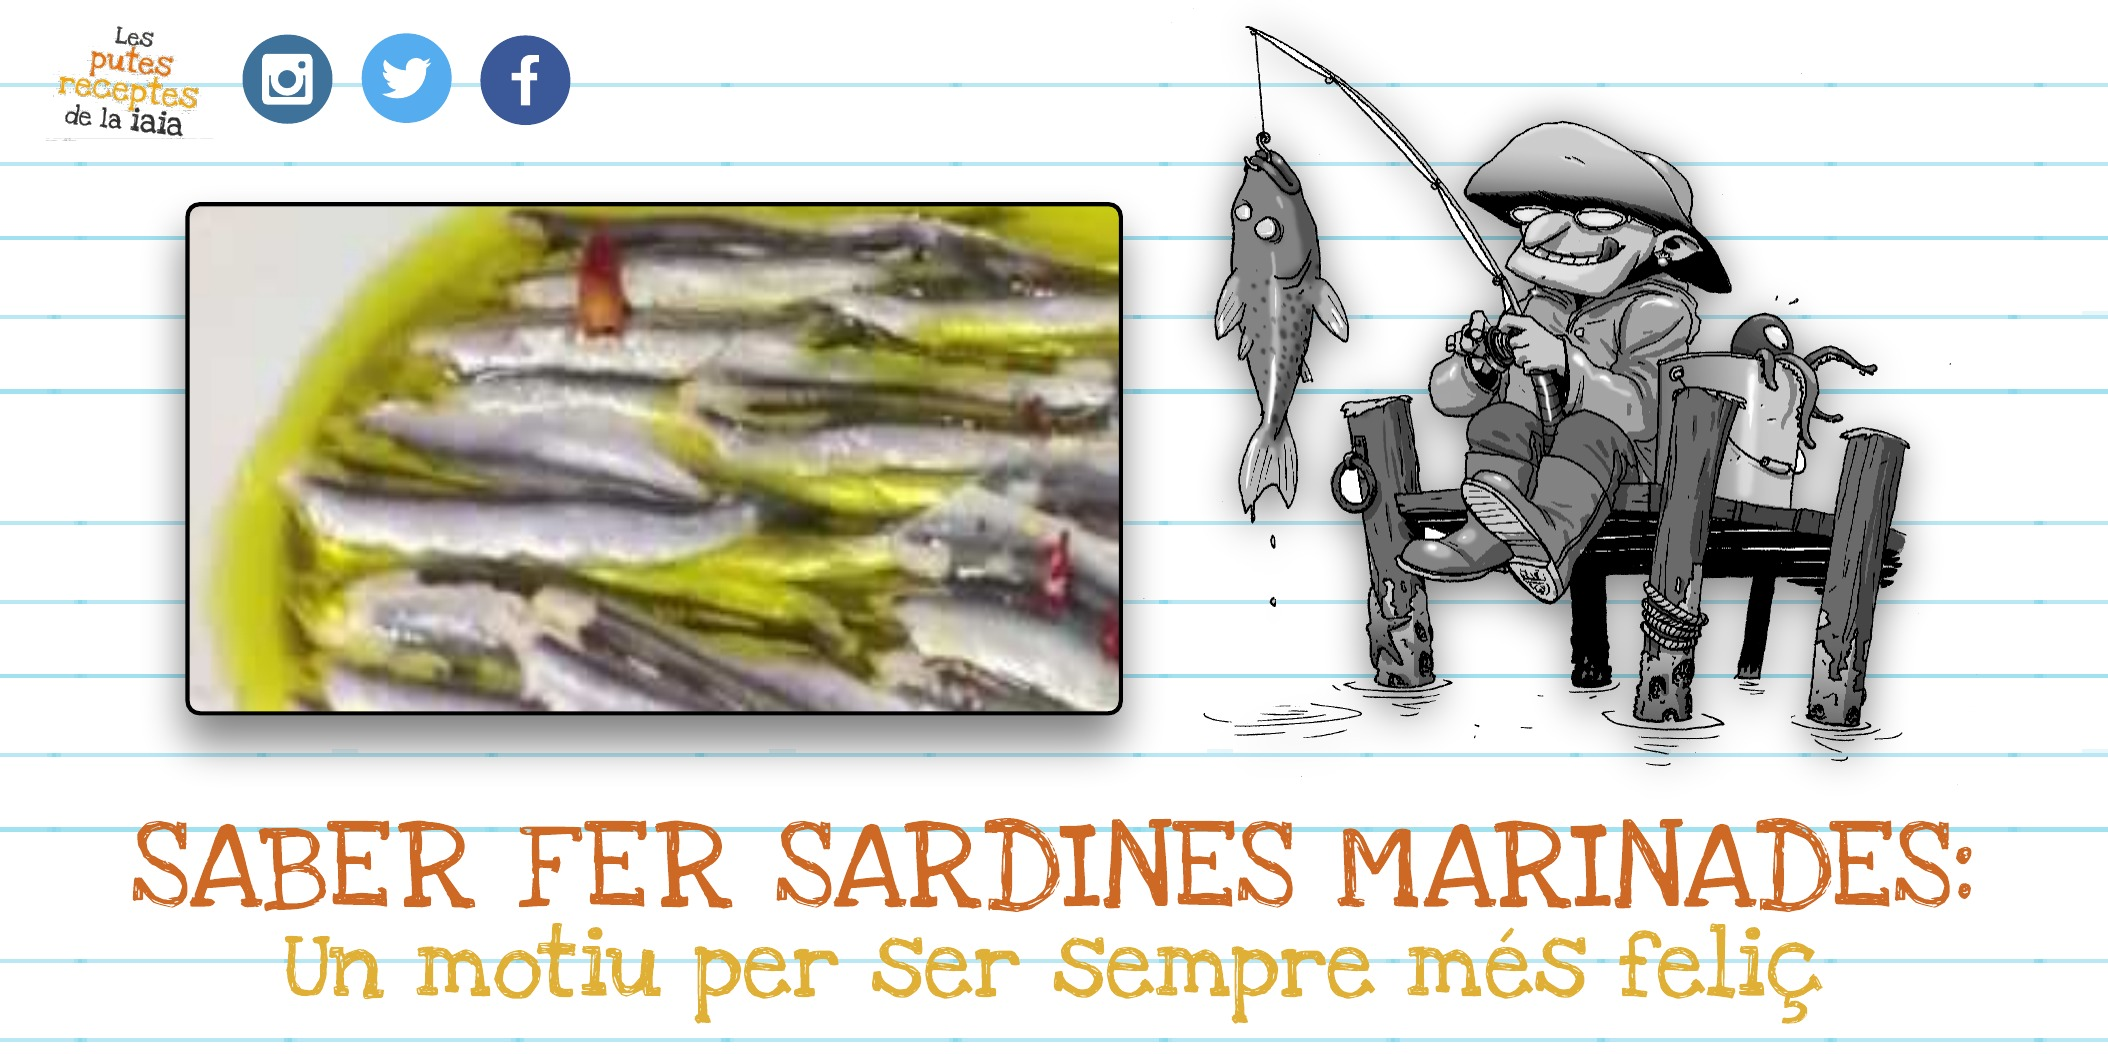 Cardem sardines marinades